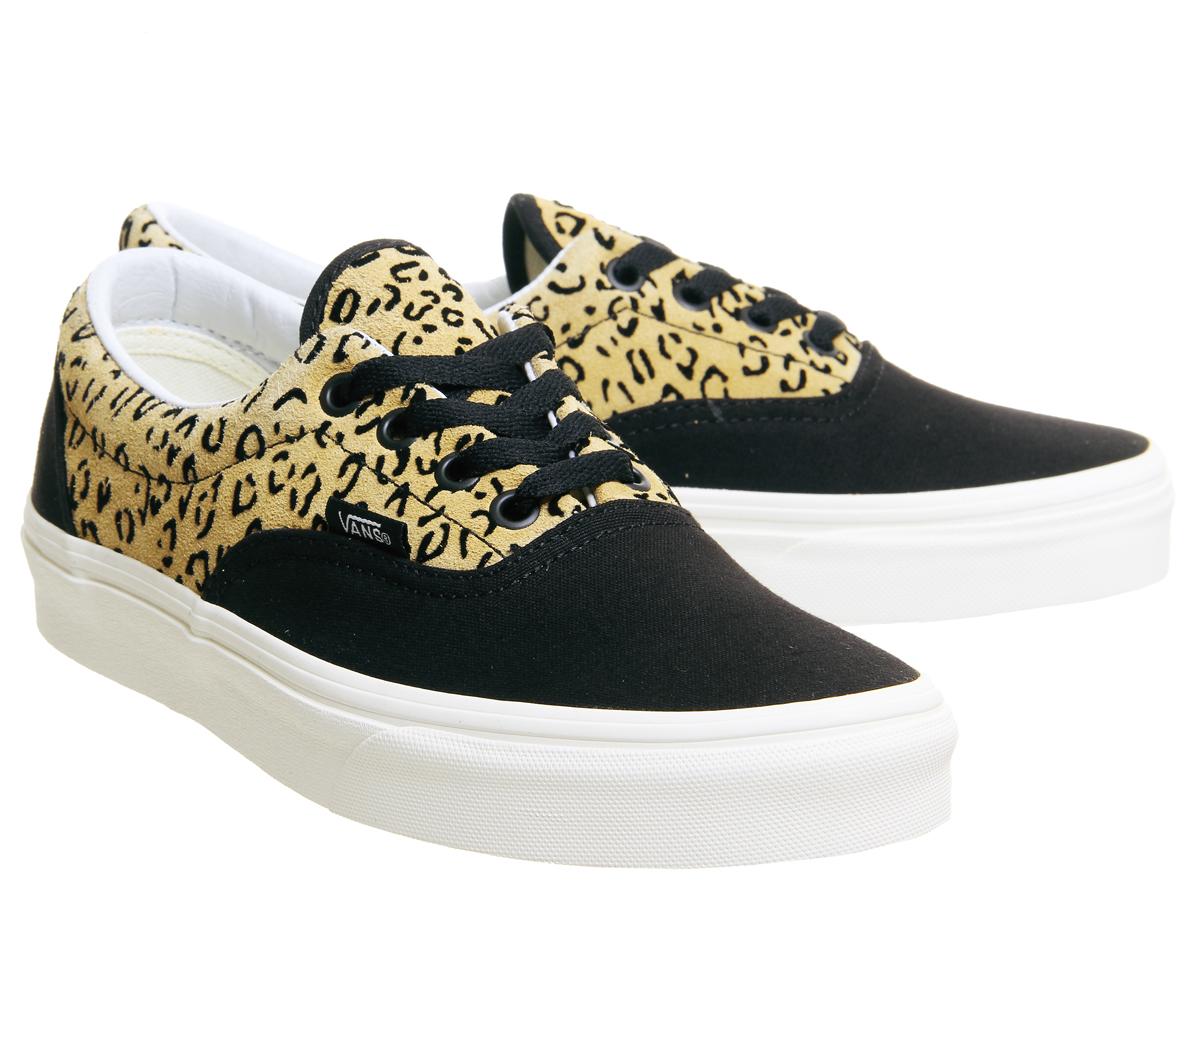 Mens Vans Era Trainers LEOPARD BLACK TAFFY MARSHMELLOW EXCLUSIVE Trainers Schuhes